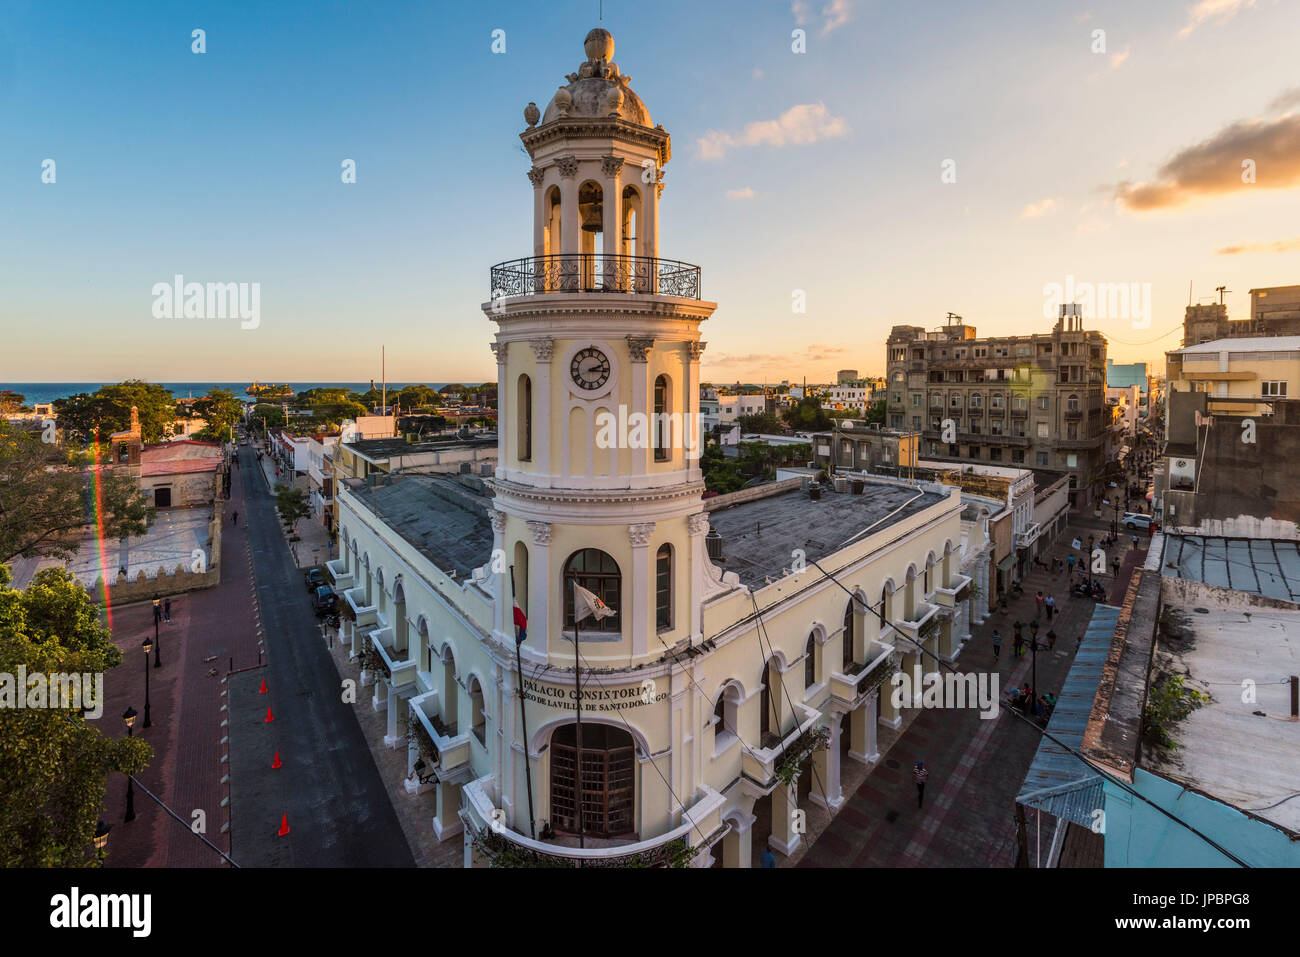 Zona Colonial (Ciudad Colonial), Santo Domingo, Dominikanische Republik. Die kolonialen Architekturen des Palacio Stockbild